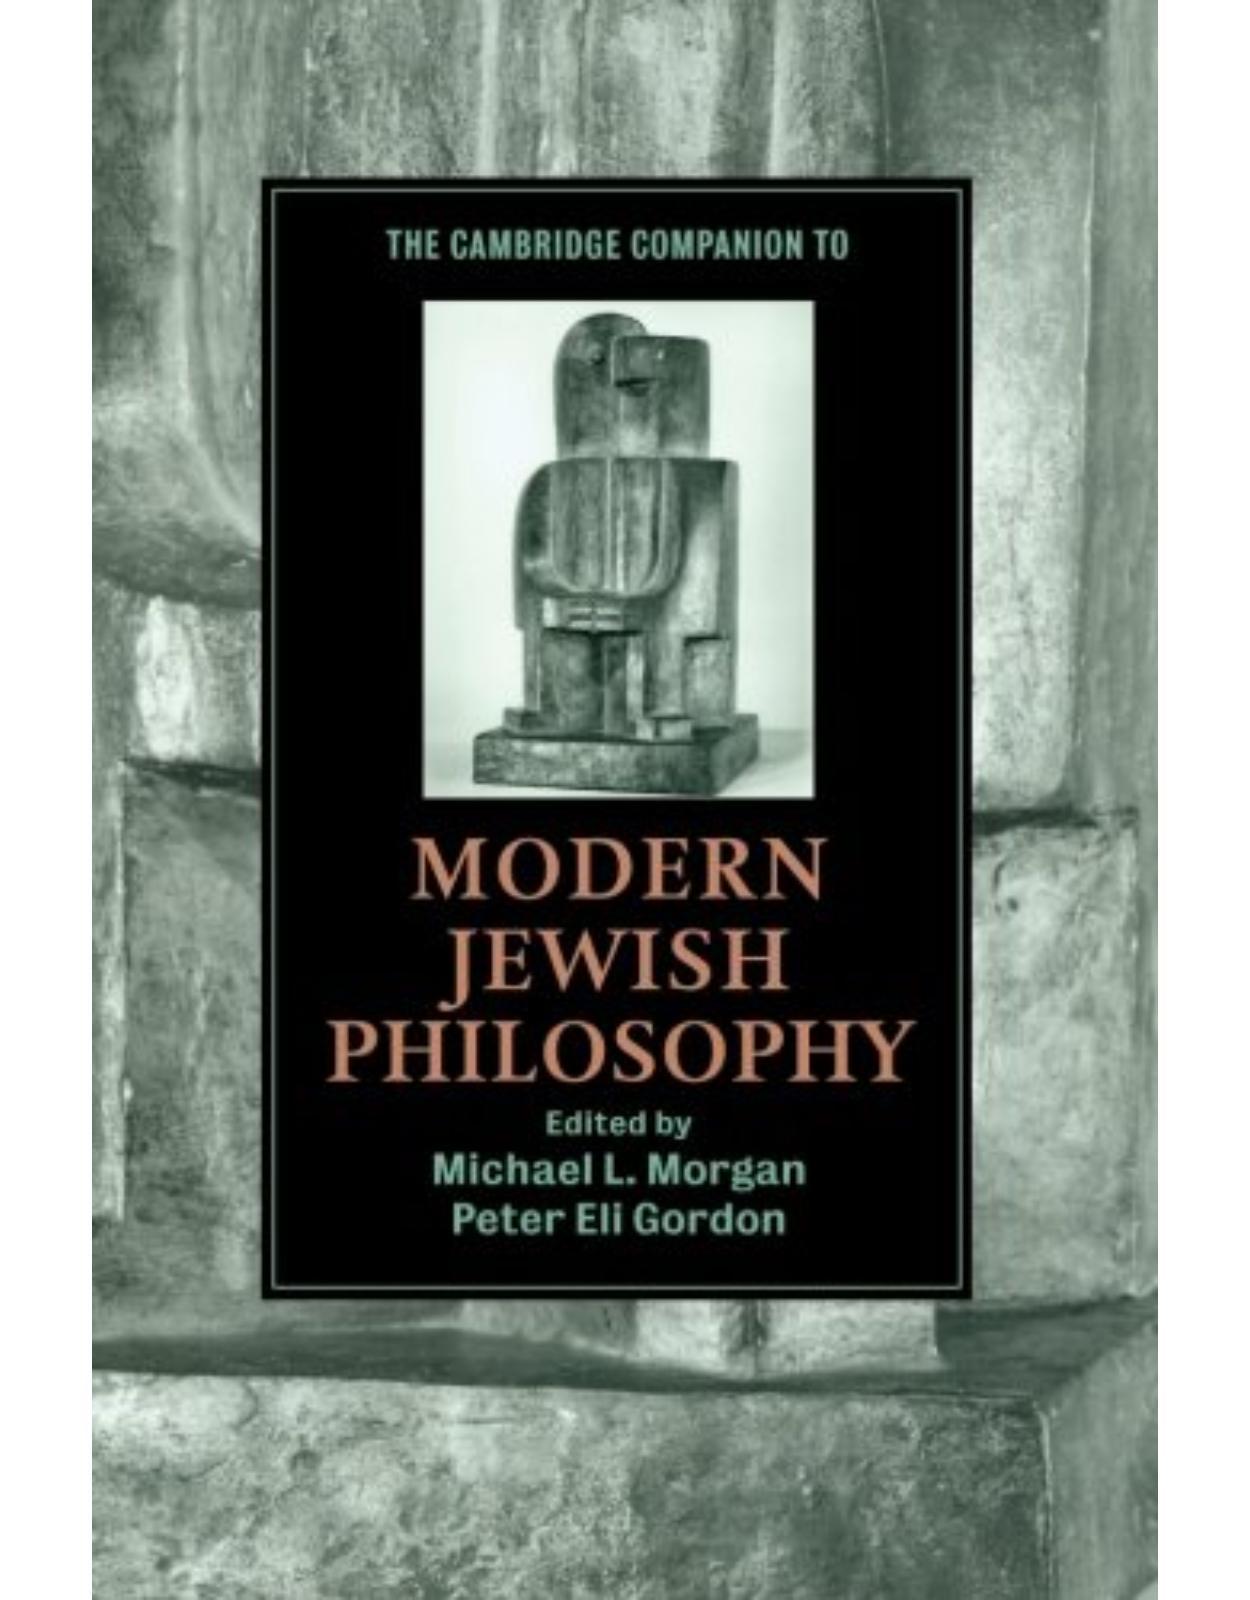 The Cambridge Companion to Modern Jewish Philosophy (Cambridge Companions to Religion)